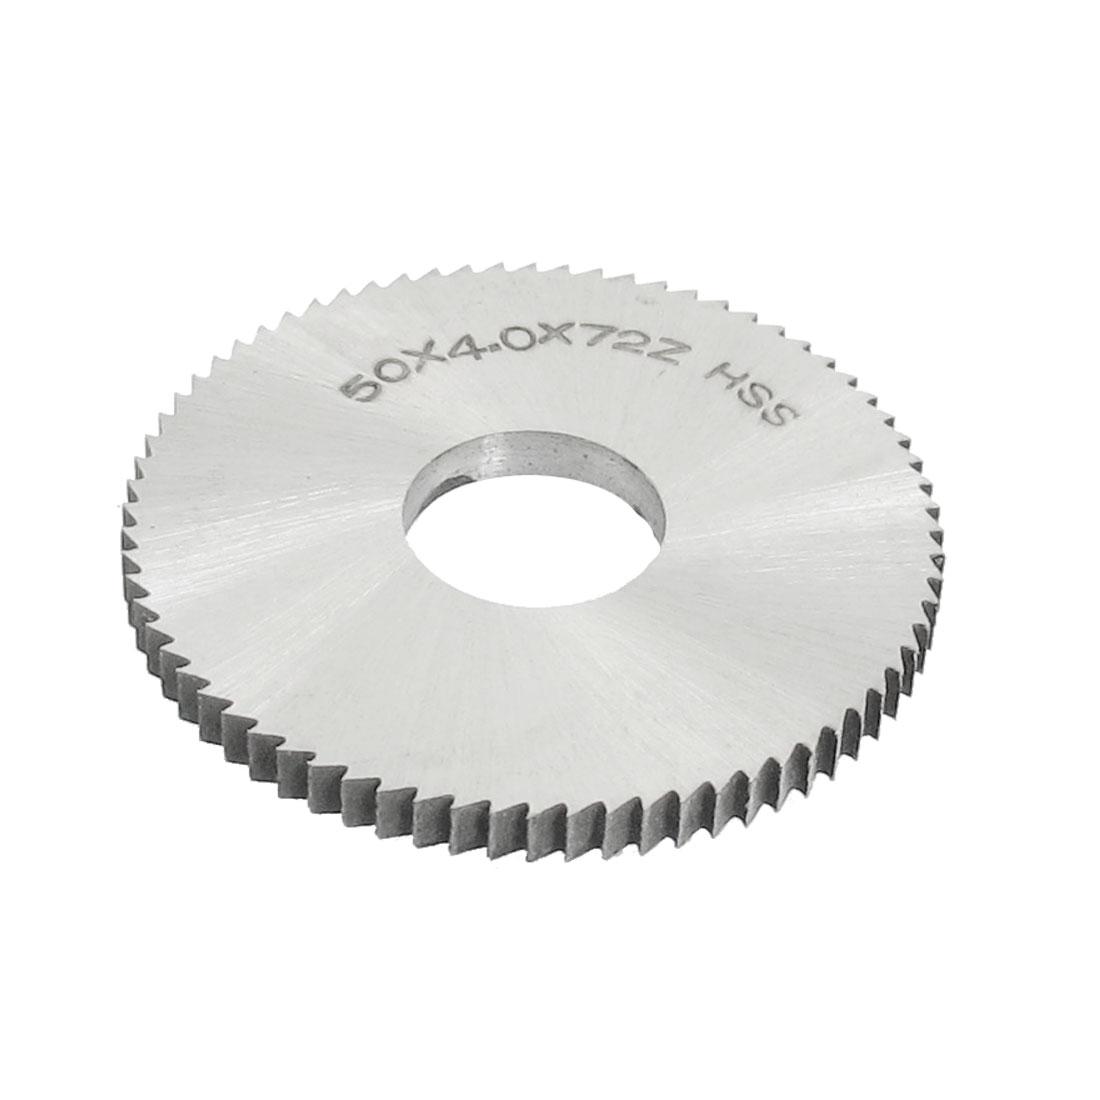 Cutting Tool 50mm x 16mm x 4mm 72 Peg Teeth HSS Slotting Saw